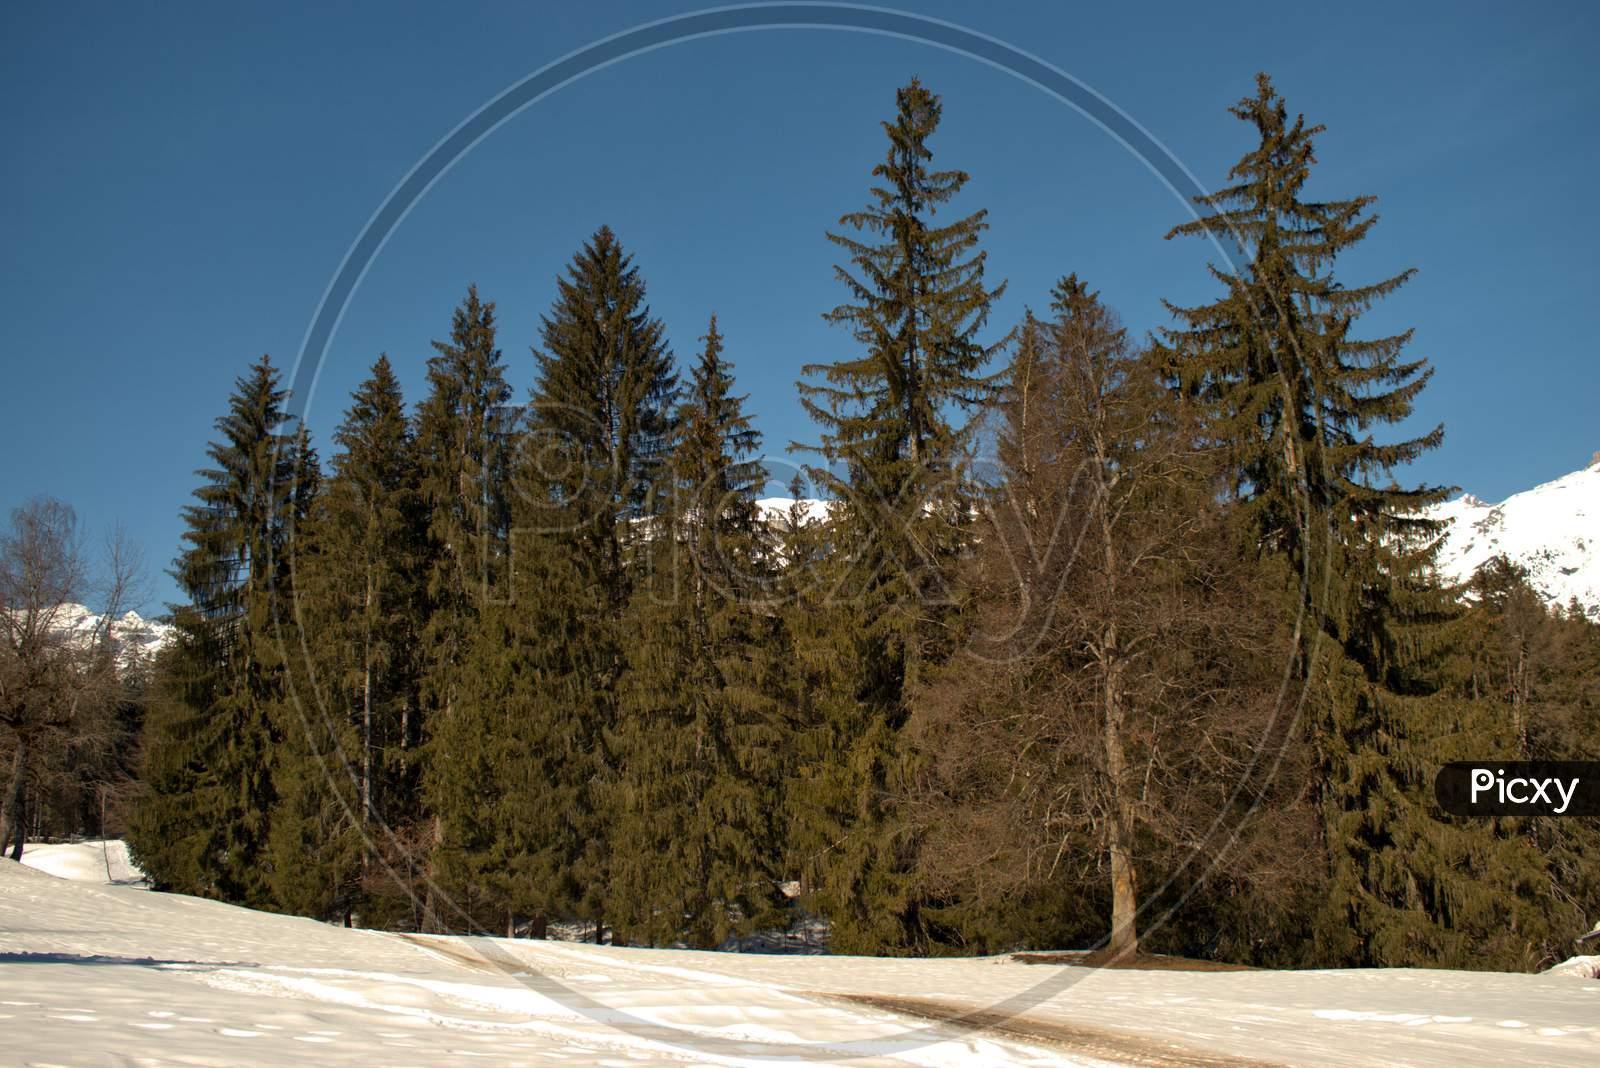 Winter In A Forest Near Flims In Switzerland 20.2.2021